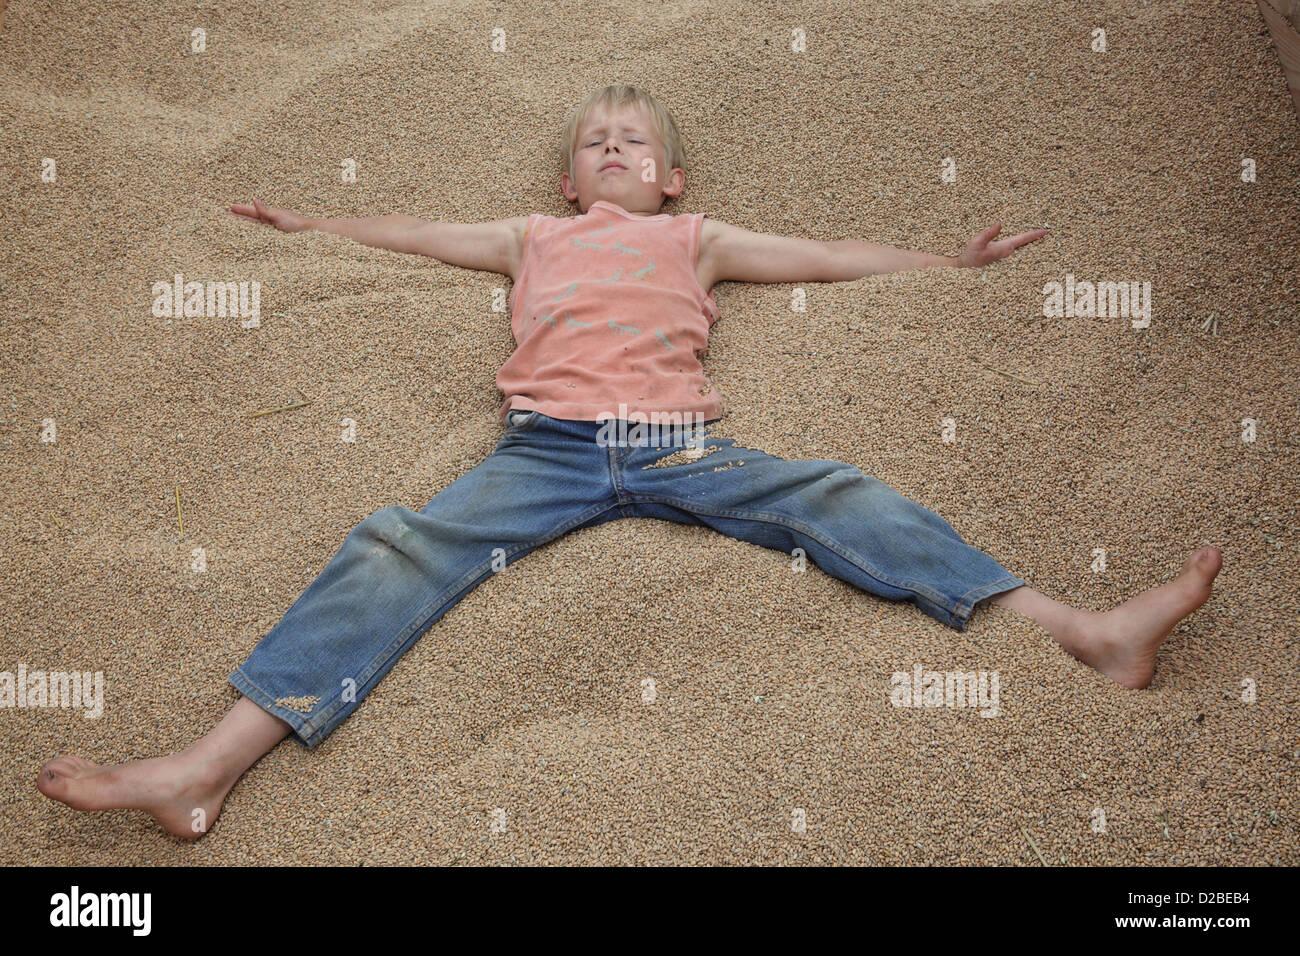 Resplendent village, Germany, boy lies on Weizenkoernern Stock Photo